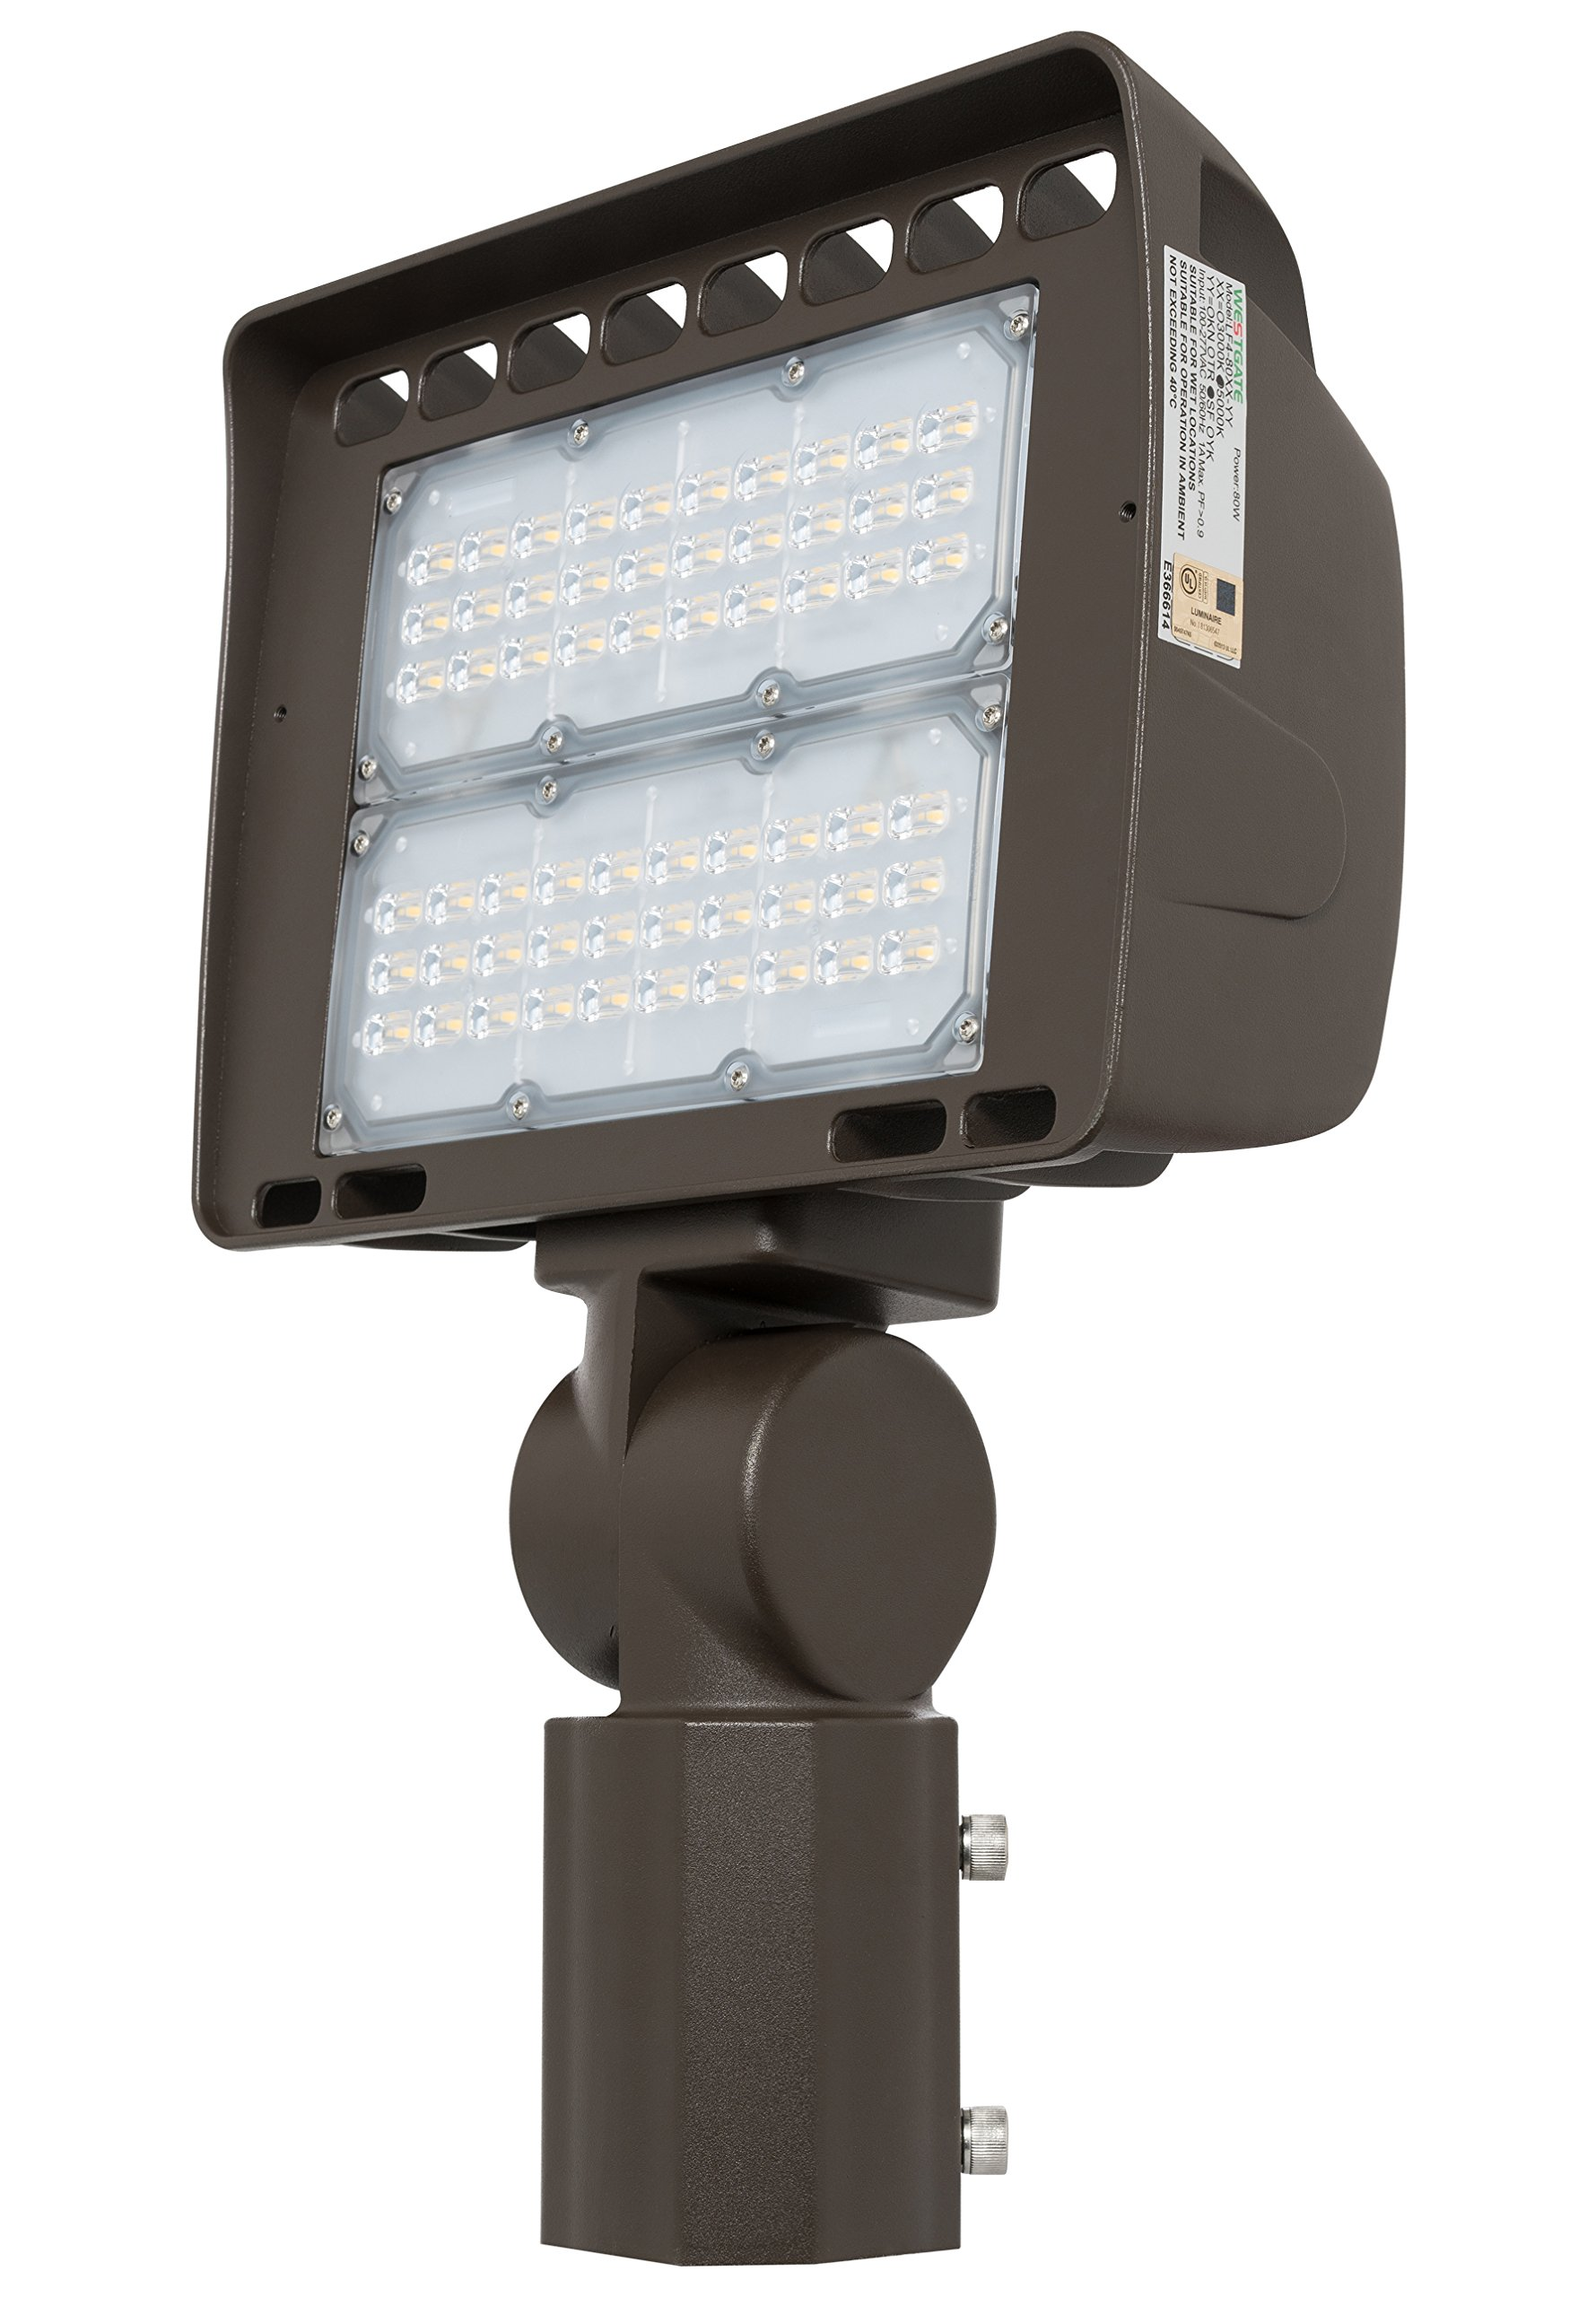 Westgate Lighting Outdoor LED Flood Light Fixture Slip Fitter Mount - Shoebox Street Area Parking Pole Security Floodlights - 120-277V - IP65 Waterproof UL Listed (100 Watt, 5000K Cool White)